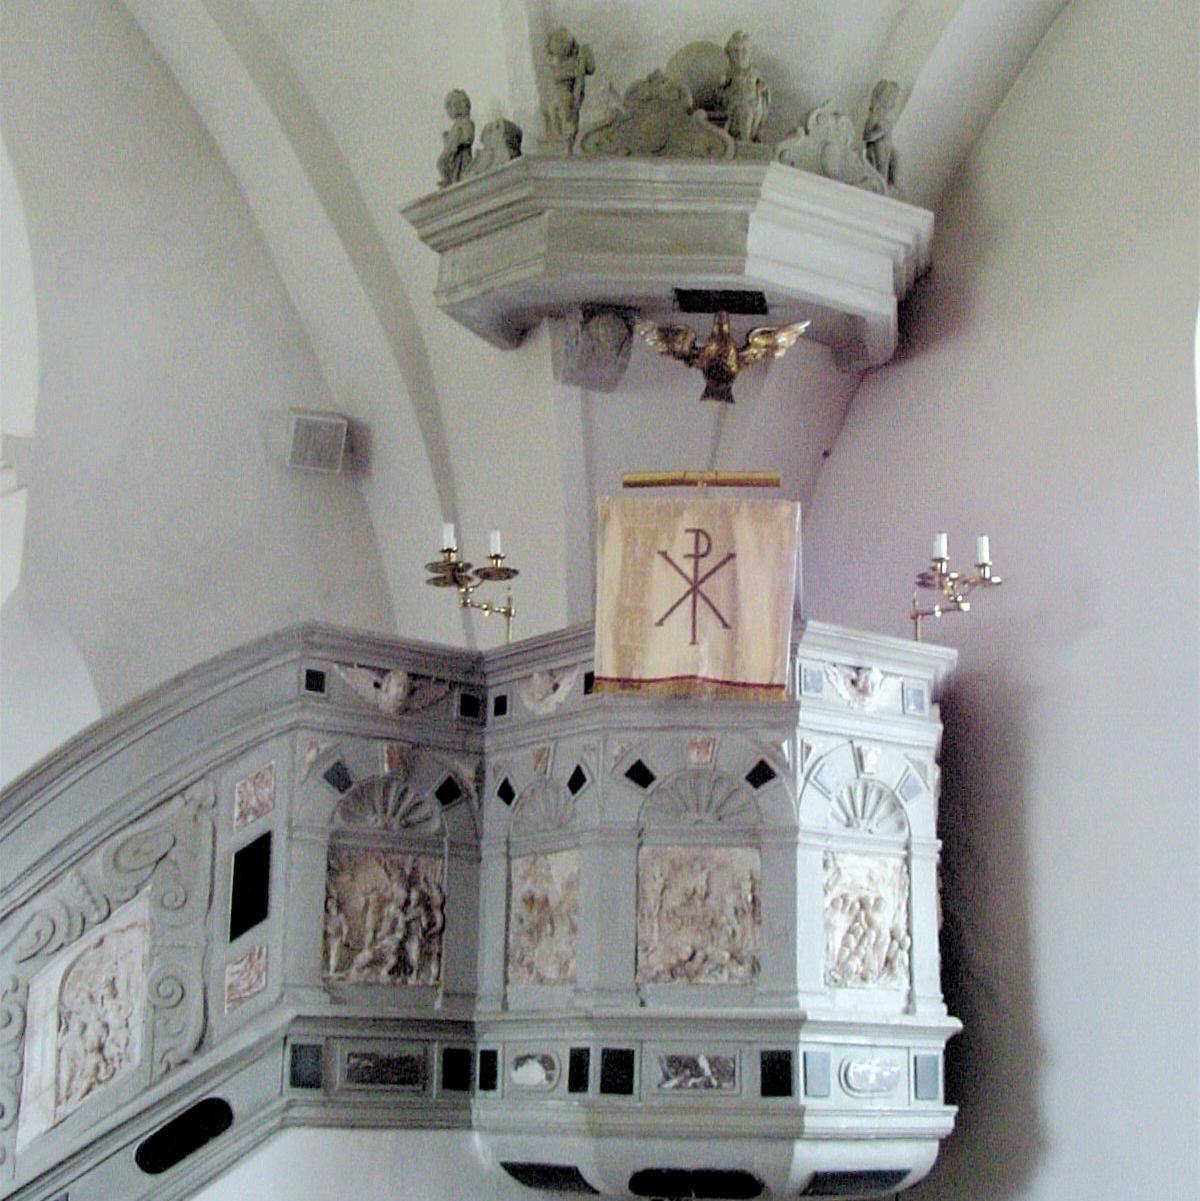 © Kävlinge kommun, Predikstol